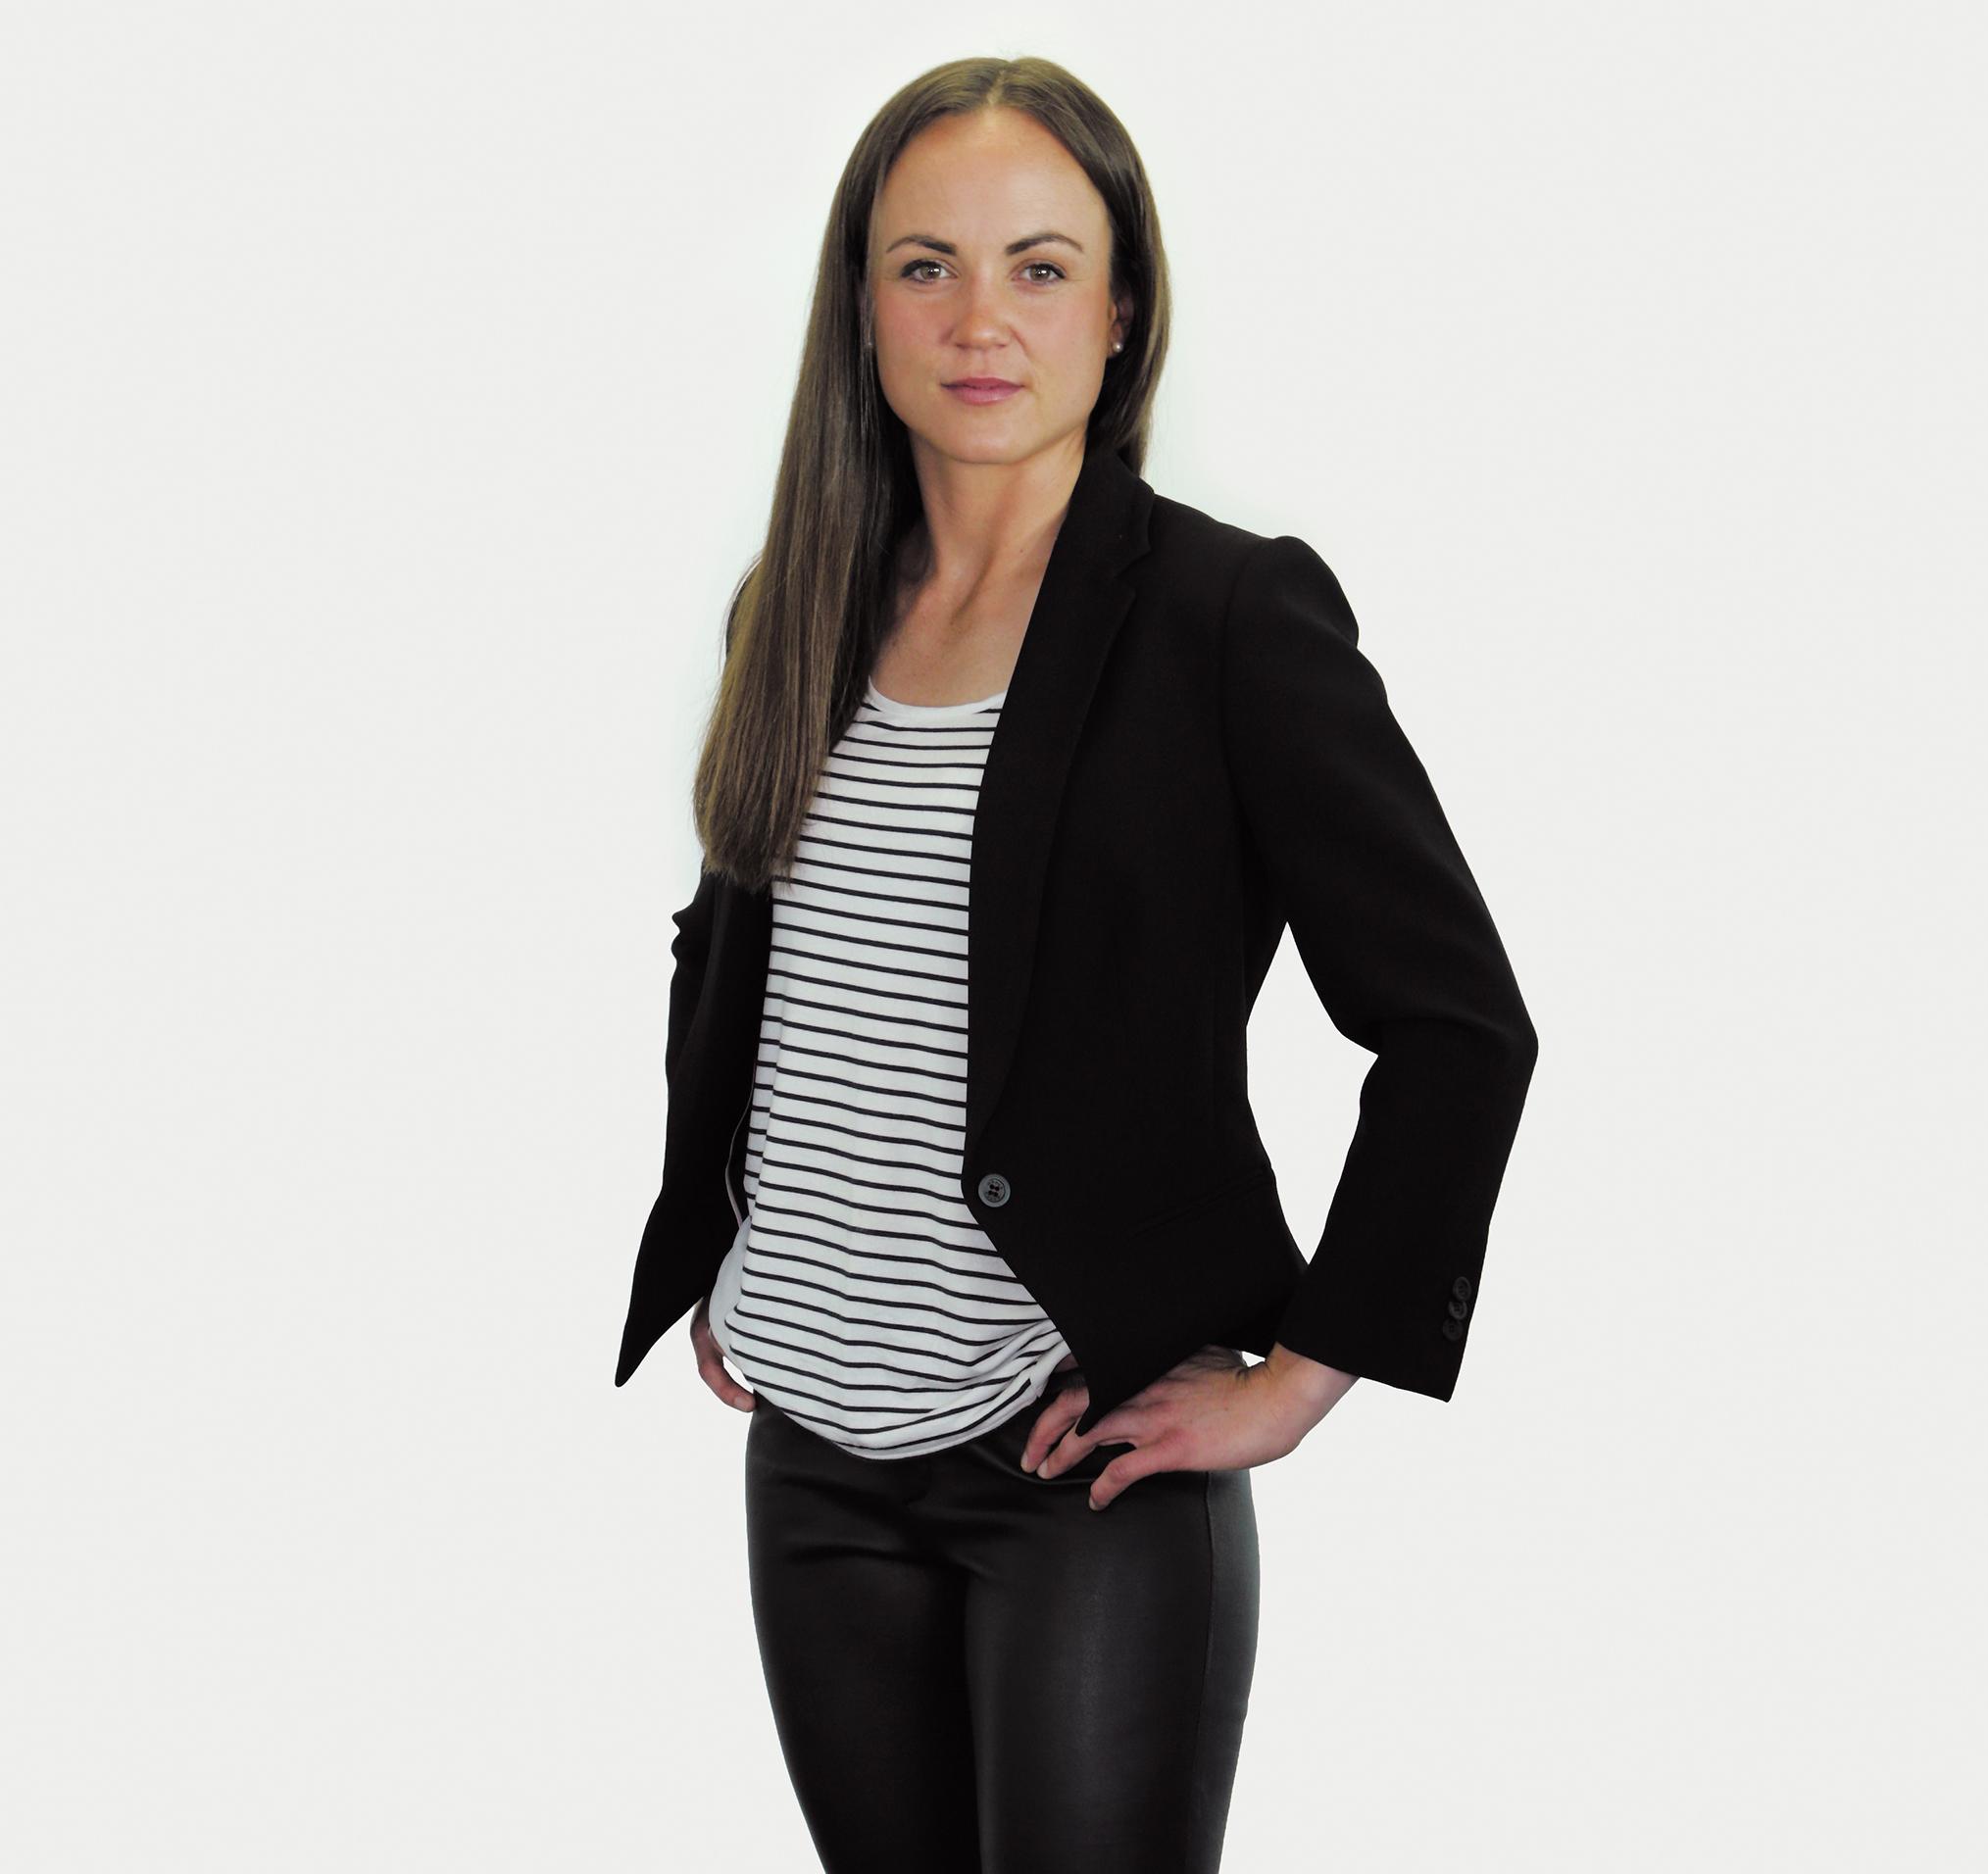 Triple A Company >> Daisy Pearce Joins Triple M's AFL Footy Call - B&T